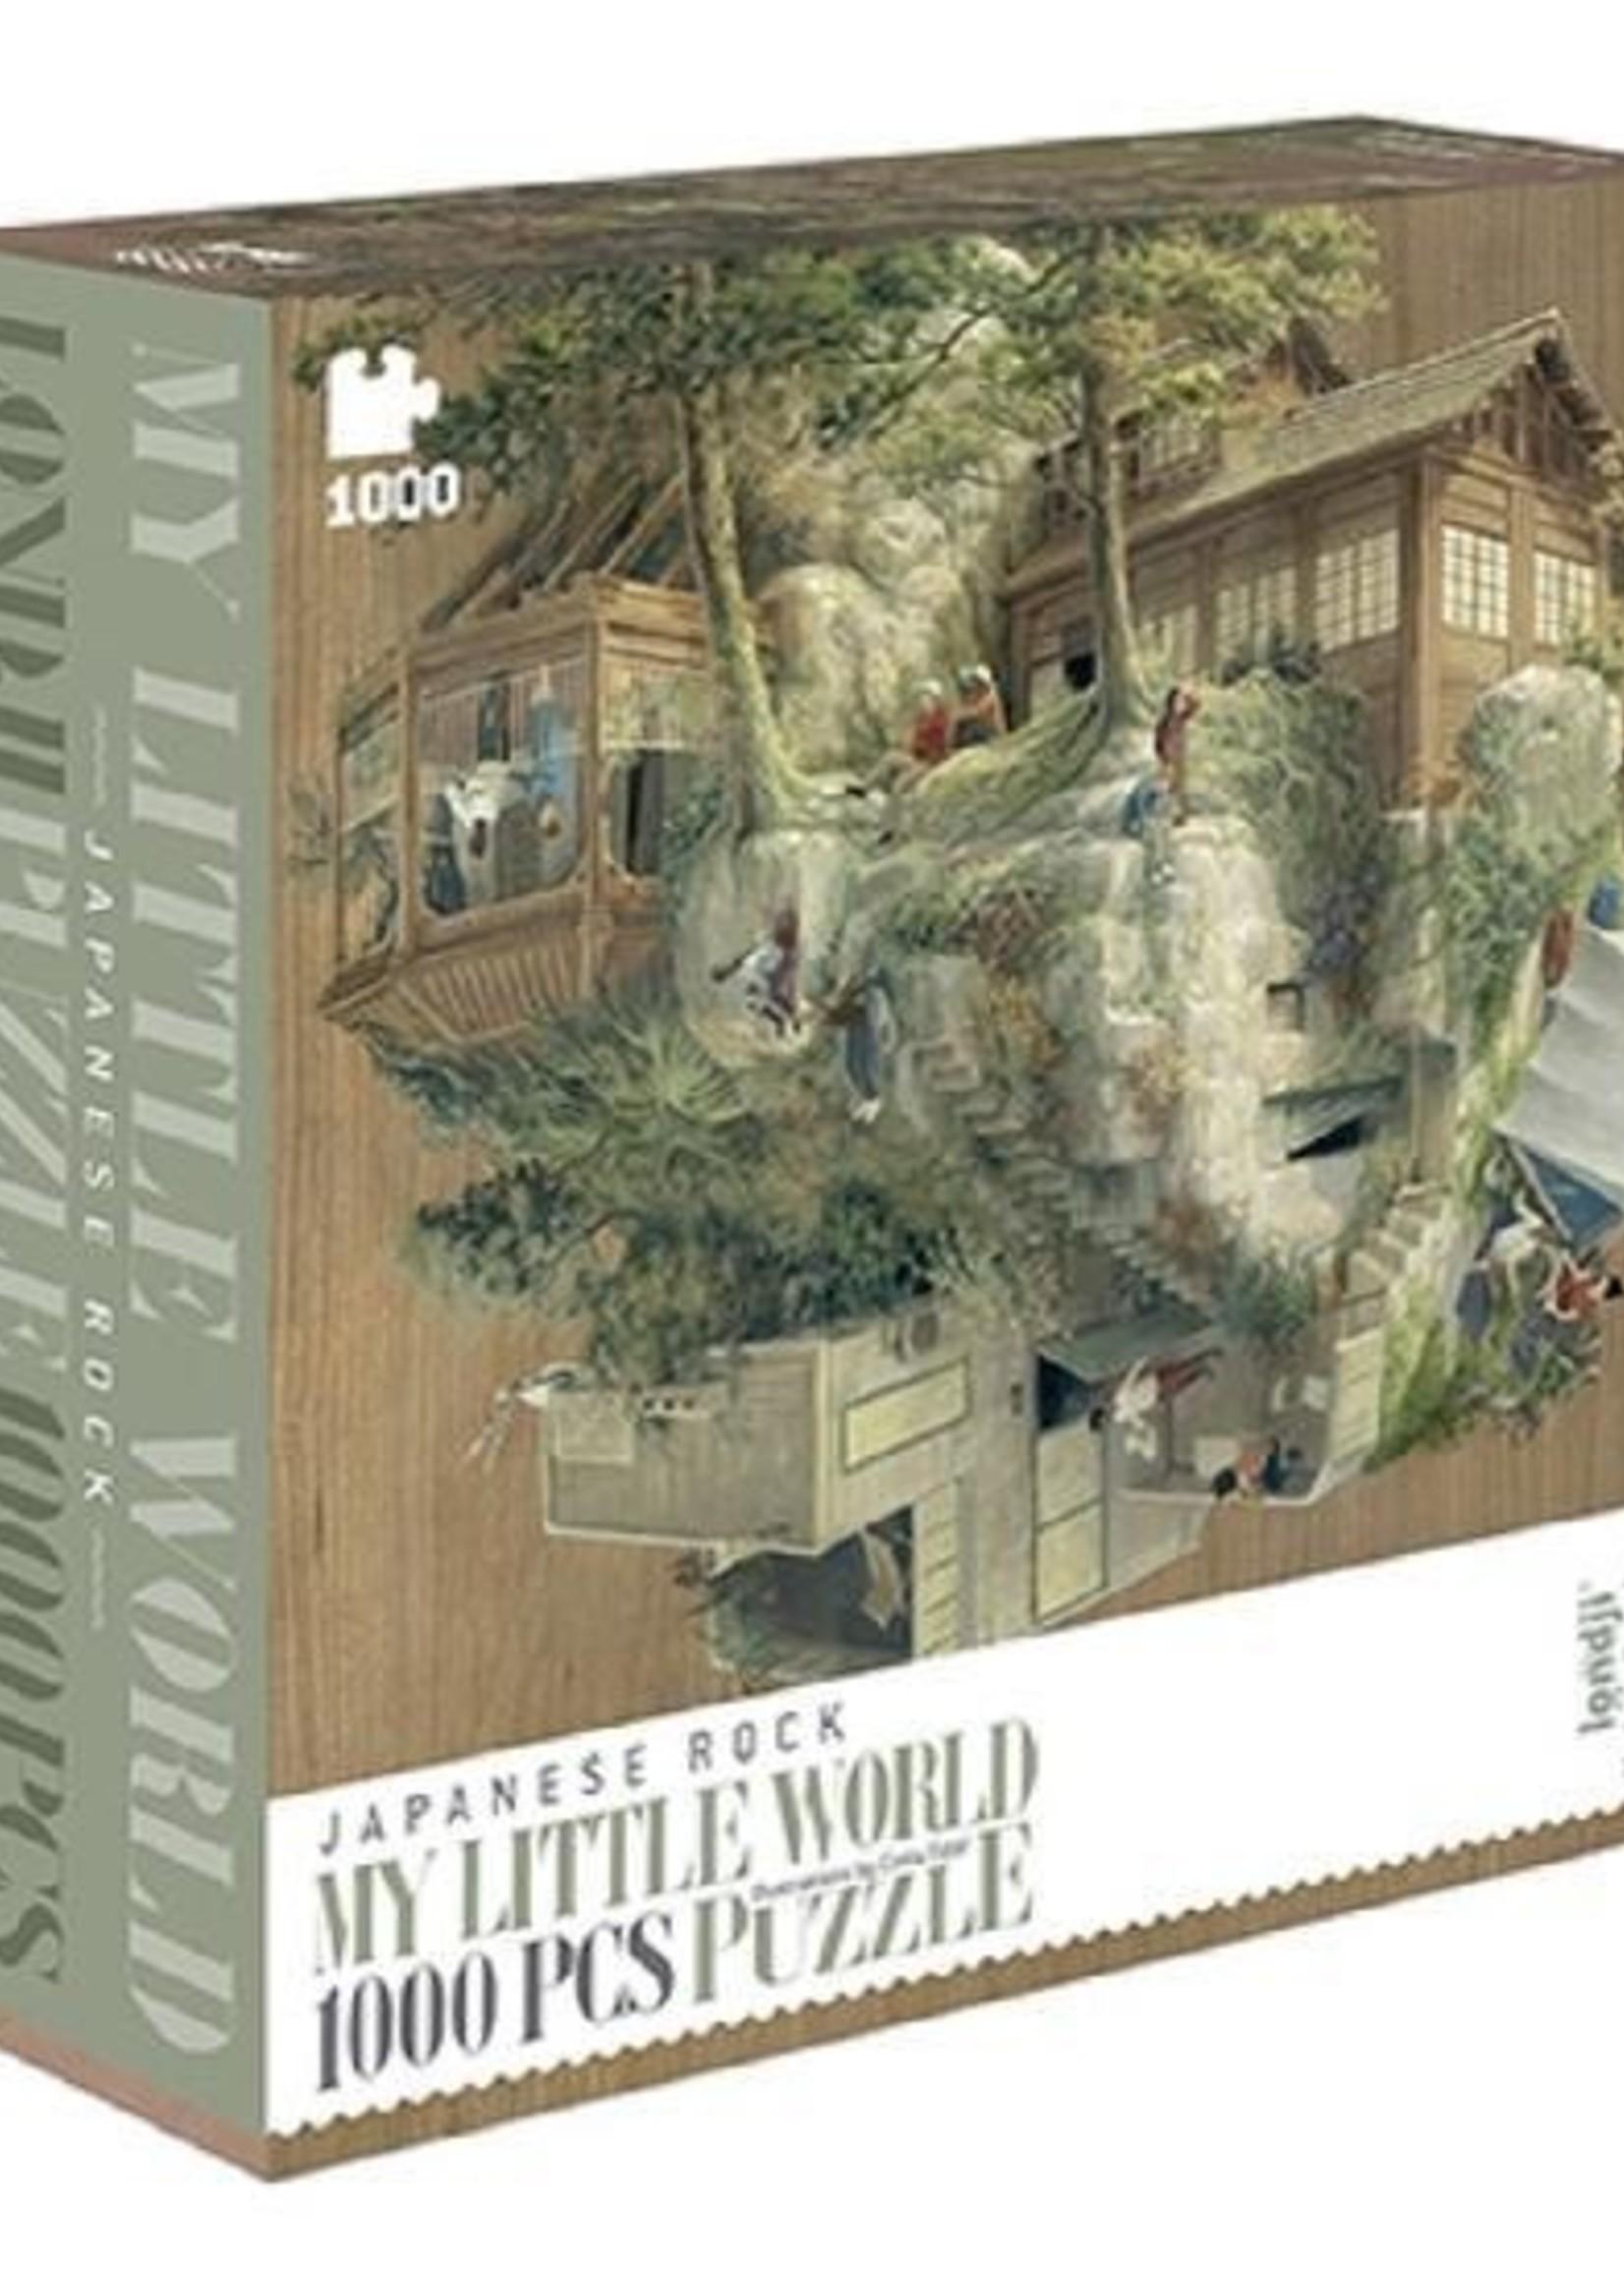 Puzzle - My Little World Japanese Rock (CASELOT 3) - Londji